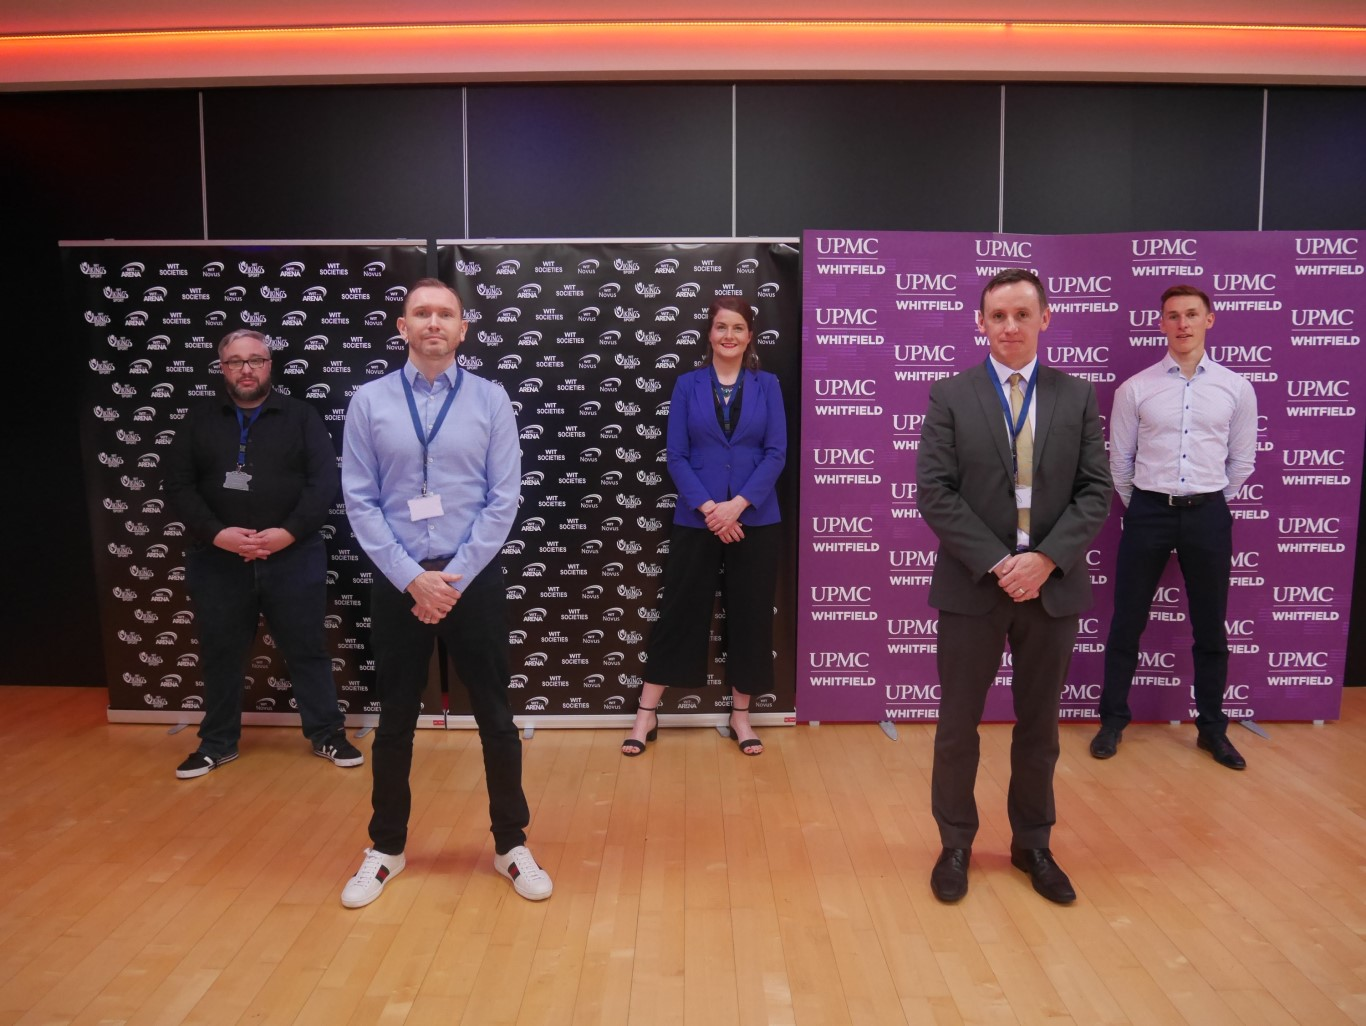 Back Row l to r: Aidan Boylan, Collegiate Esport, Aisling O' Neill, WIT ArcLabs, Killian Buckley, UPMC Ireland. Front row l to r Darragh Cunningham Ireland Esports and John Windle, Head of WIT Vikings Sport.